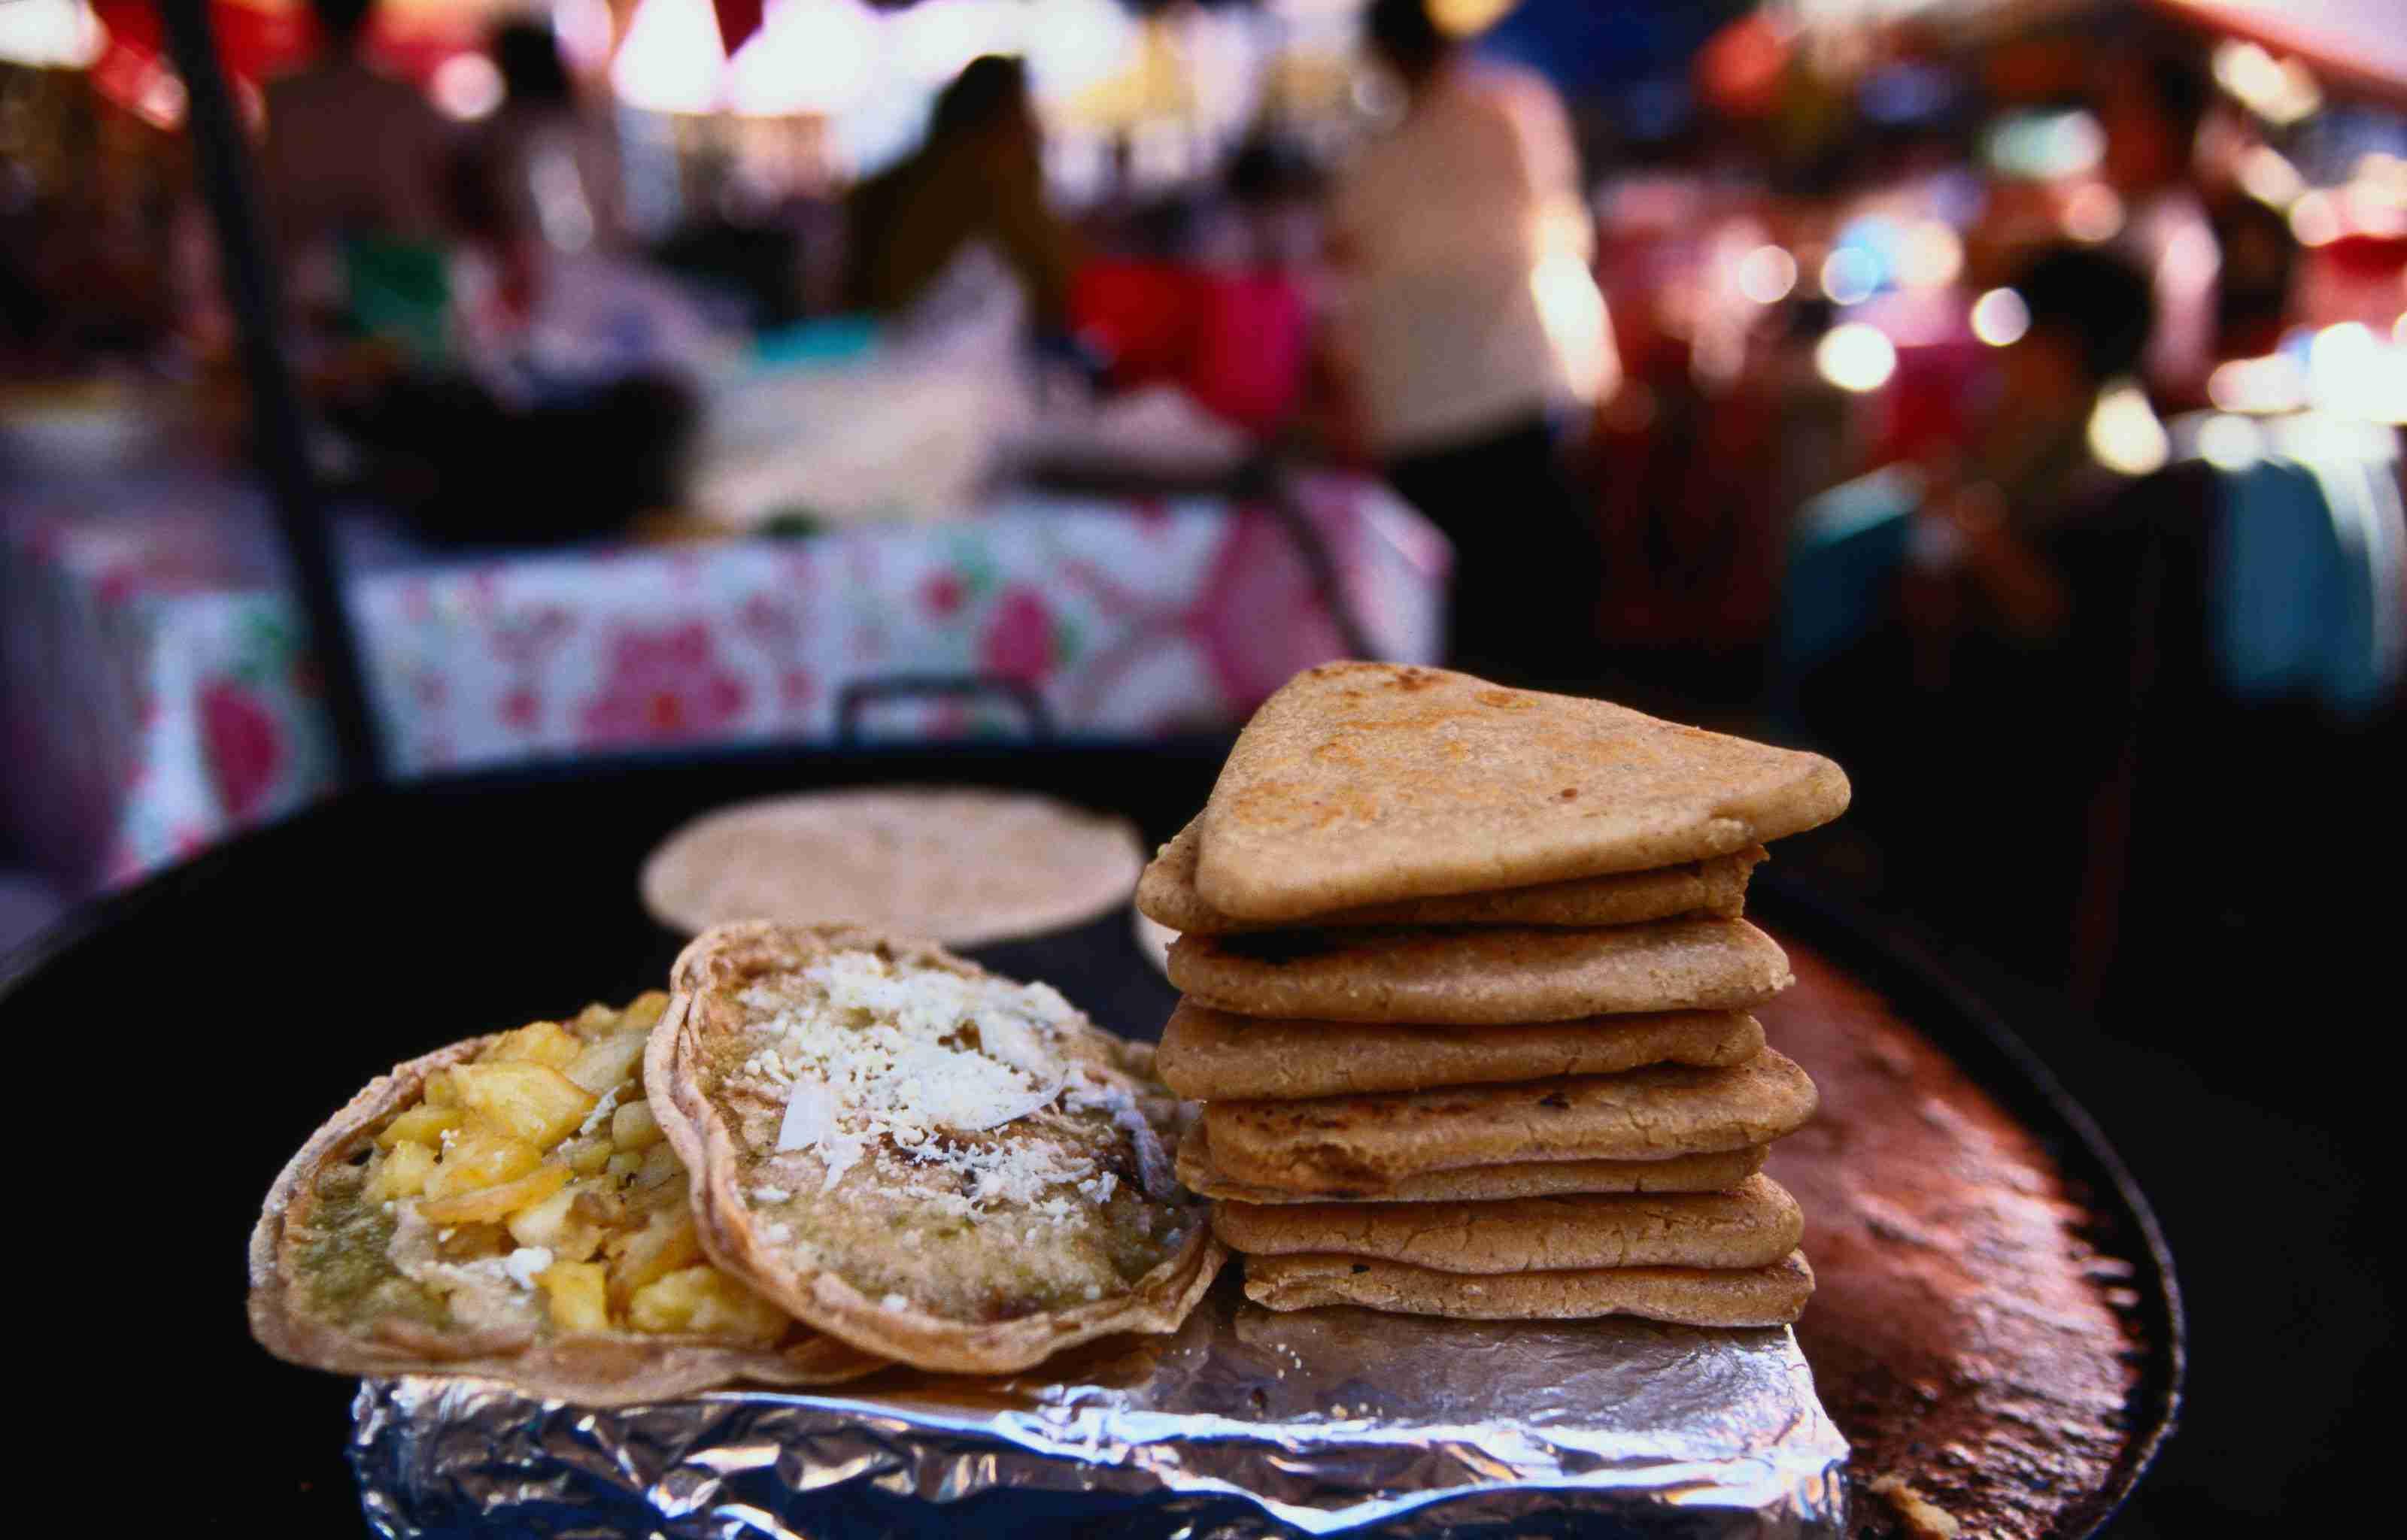 Chitacates (triangle shapes) and sopes from the market - Tepoztlan, Mexico